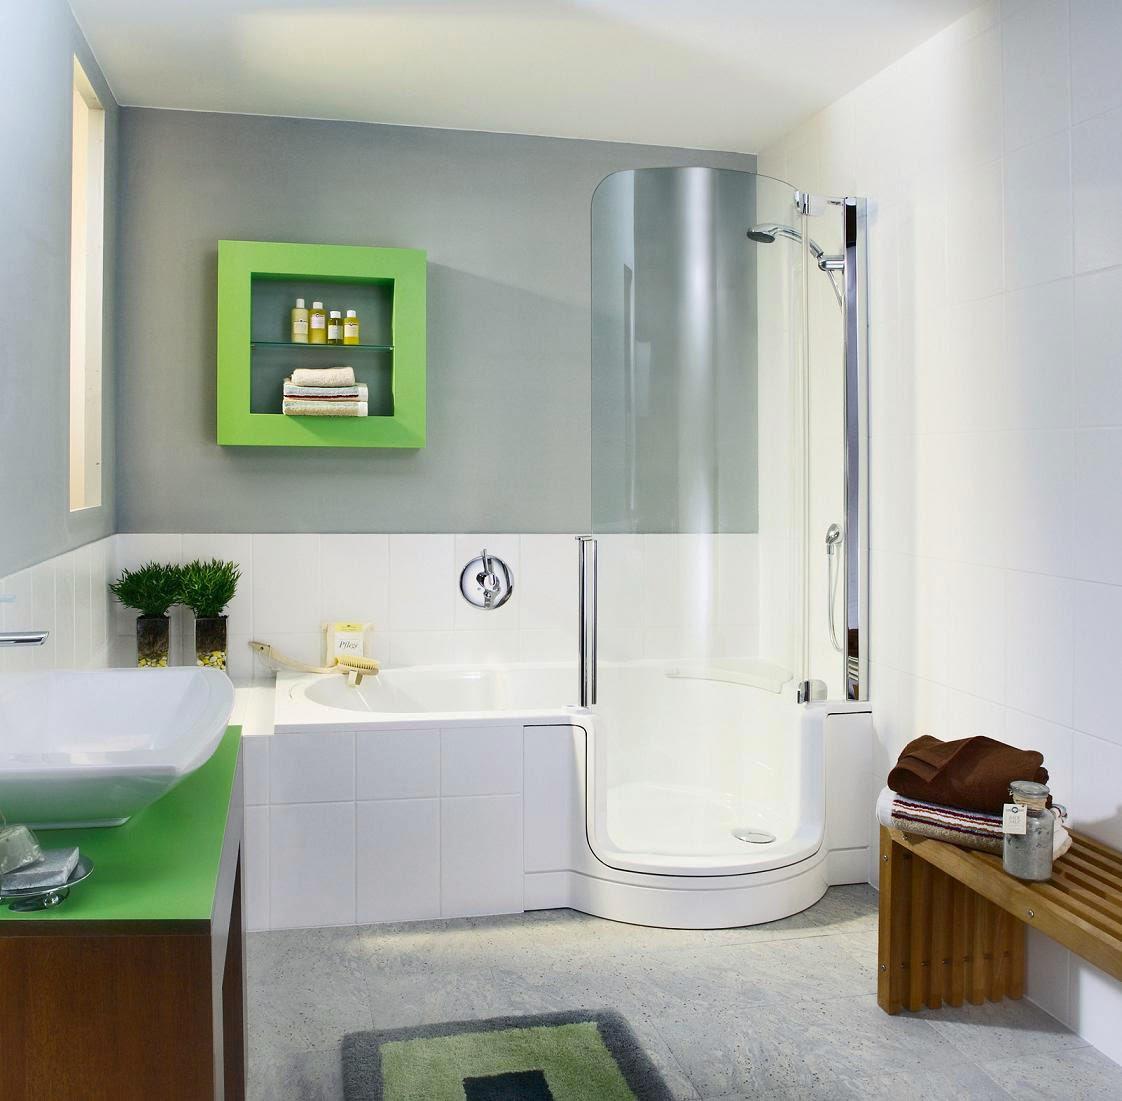 Funky bathroom ideas | Bathroom Ideas